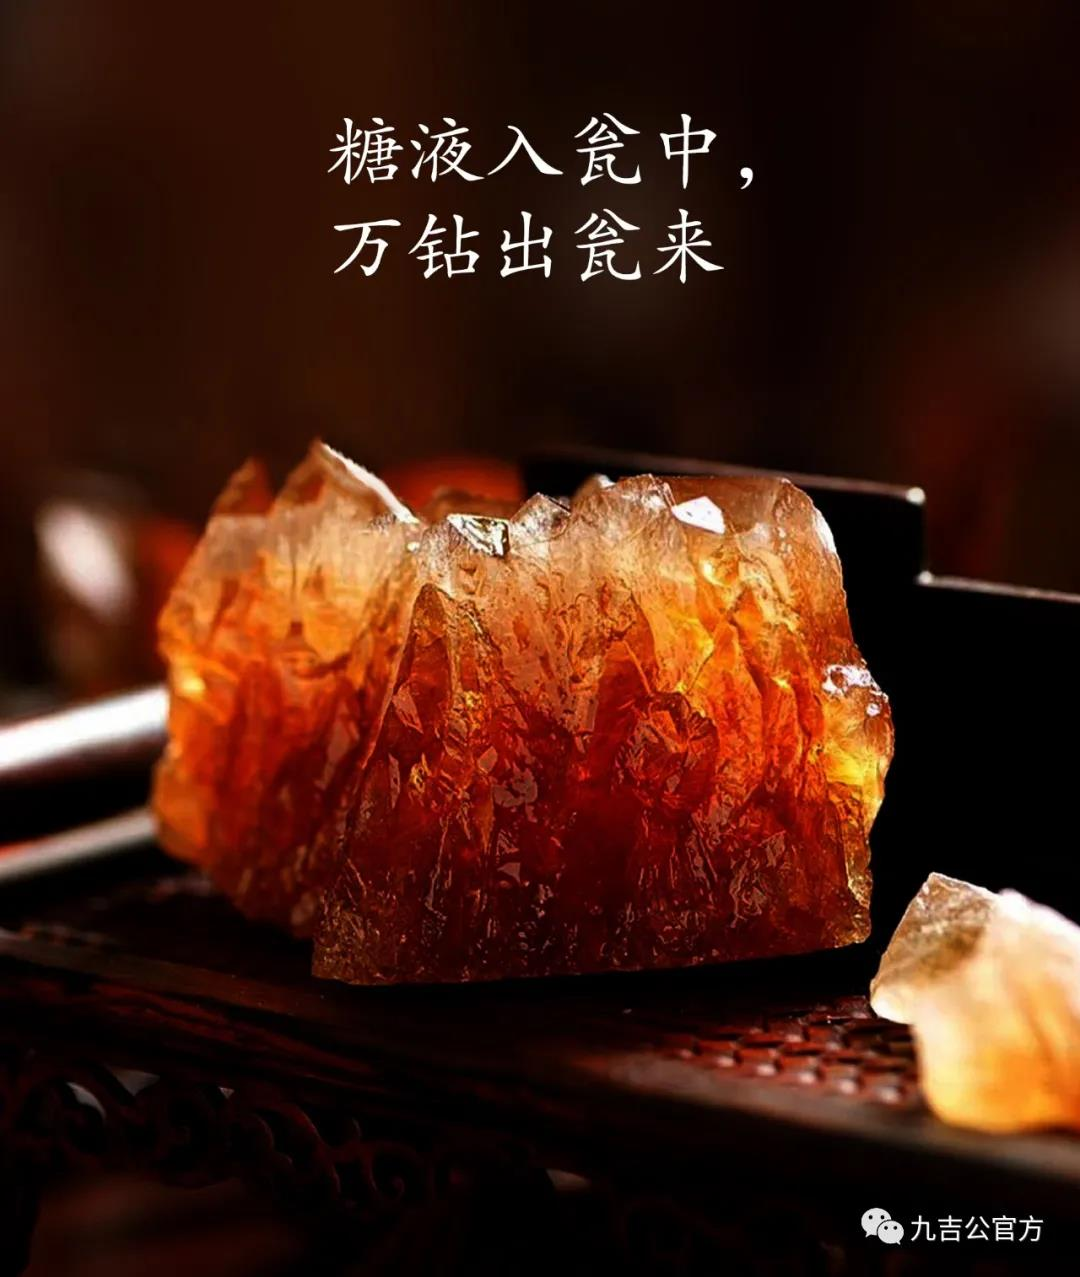 WeChat Image 20210708202359